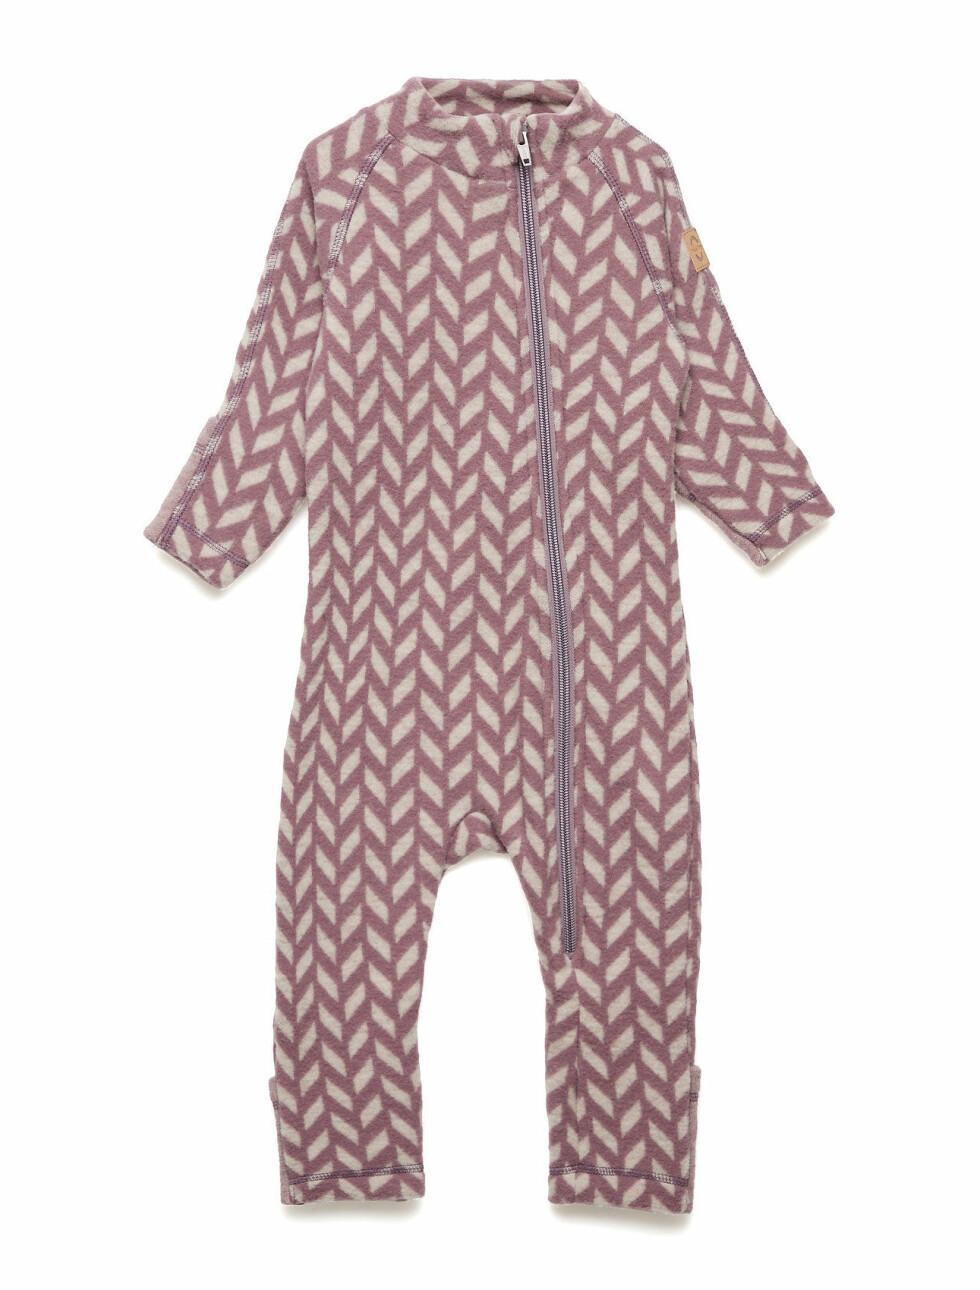 Fra Mikk-Line |599,-| https://www.boozt.com/no/no/mikkline/wool-baby-suit-jacquard_18864735/18864755?navId=68013&group=listing&position=1000000